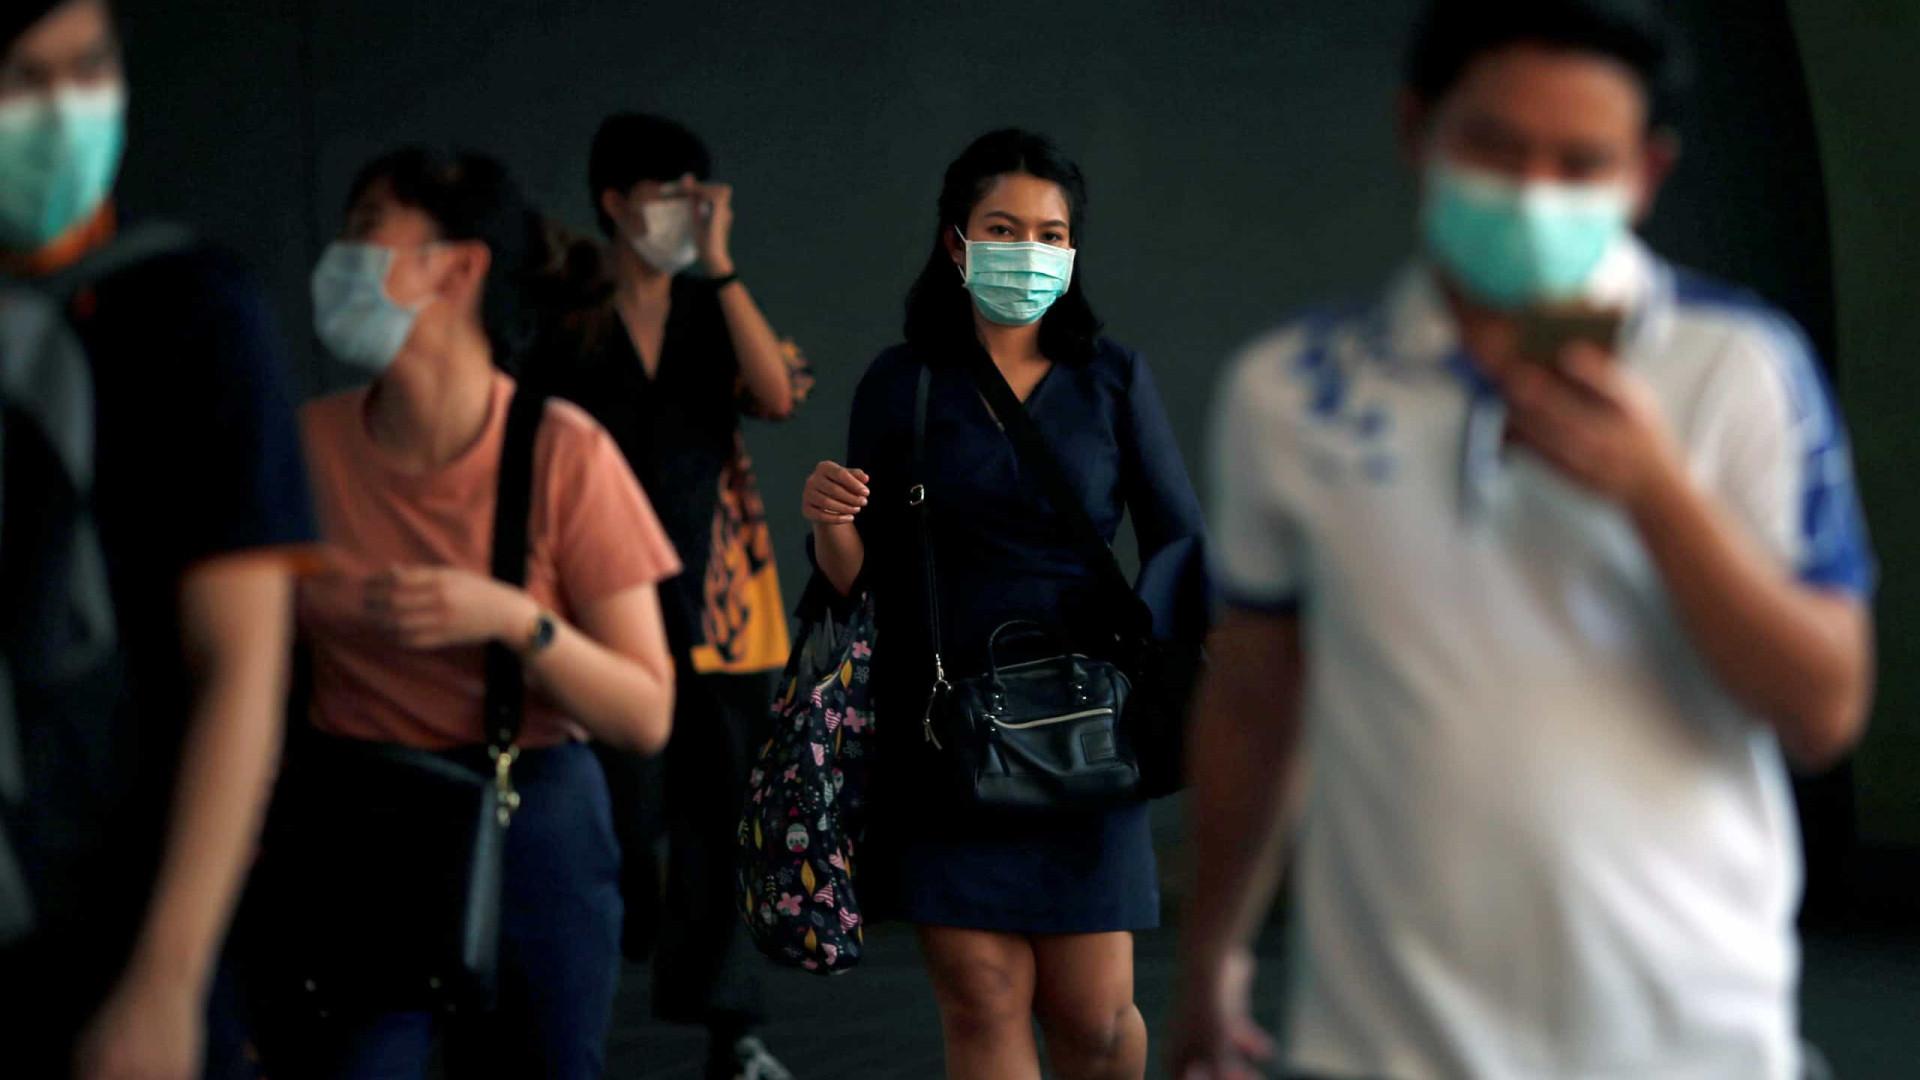 Cidade fantasma: taxista ajuda Wuhan de forma gratuita